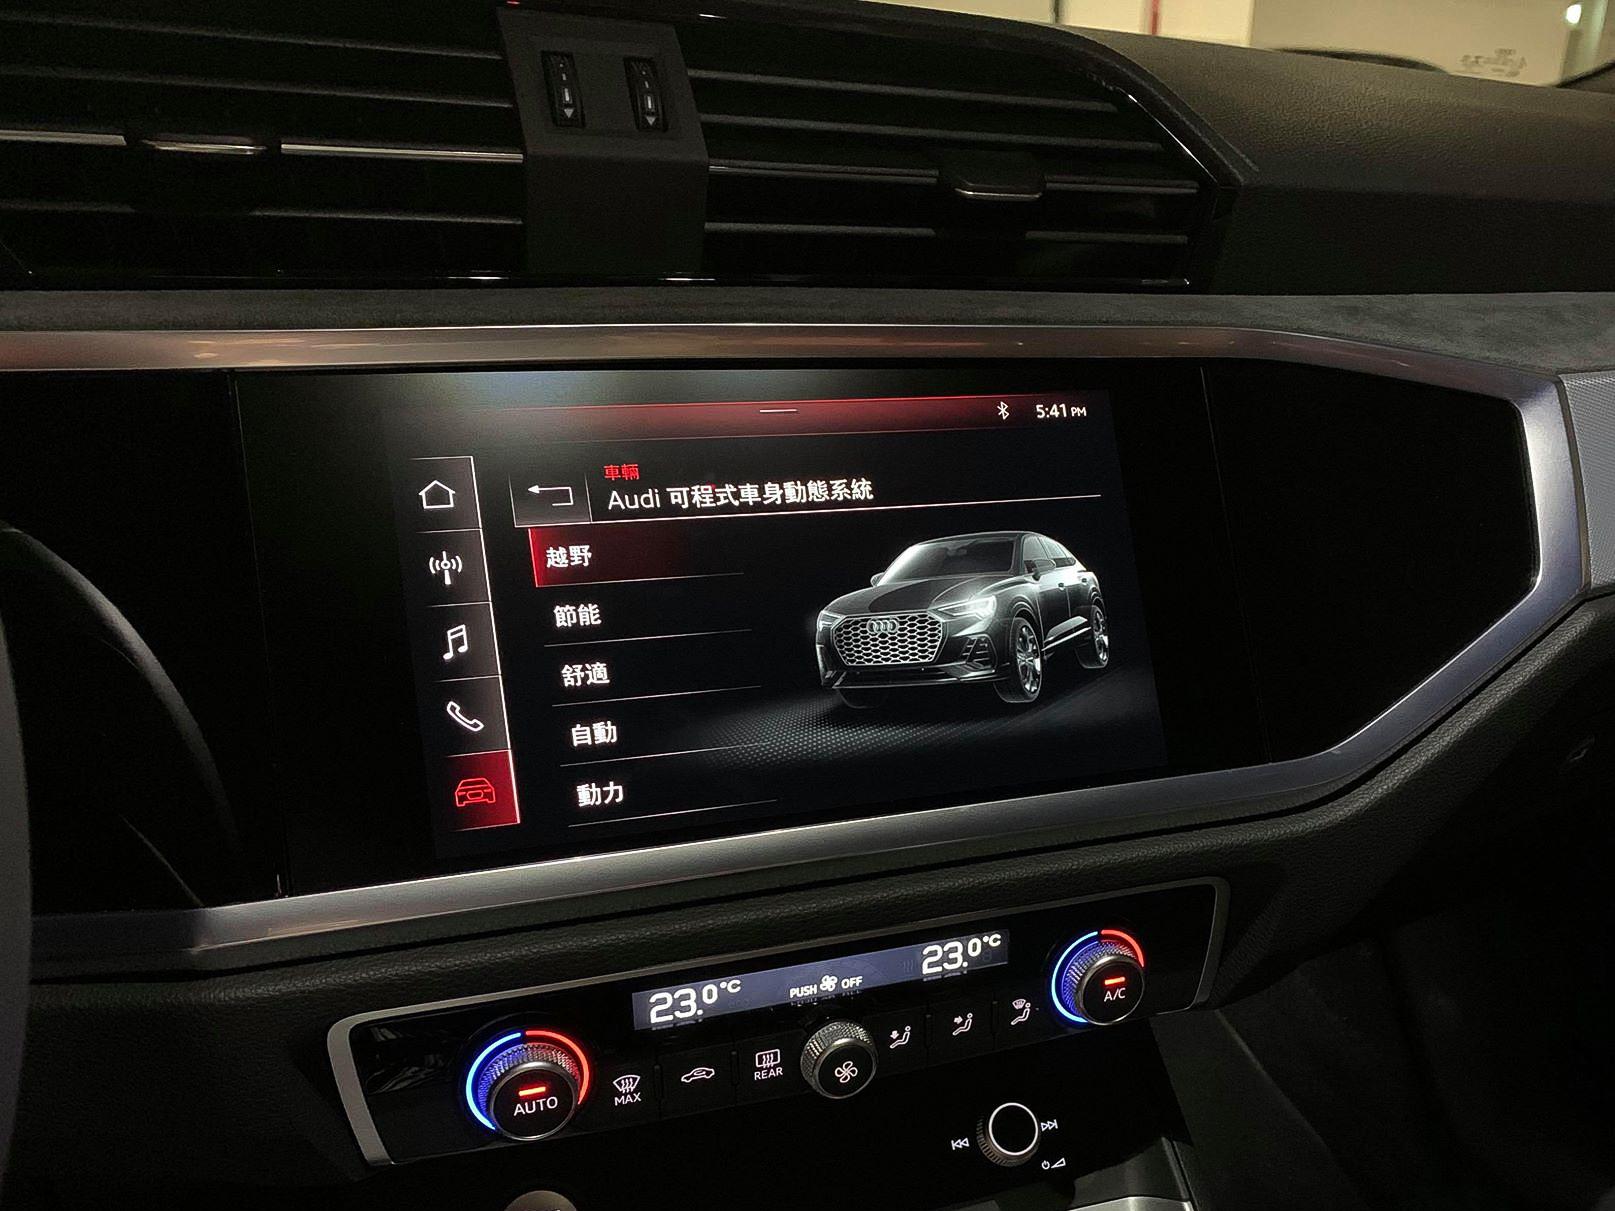 Audi drive select 可程式車身動態系統提供「越野」模式。